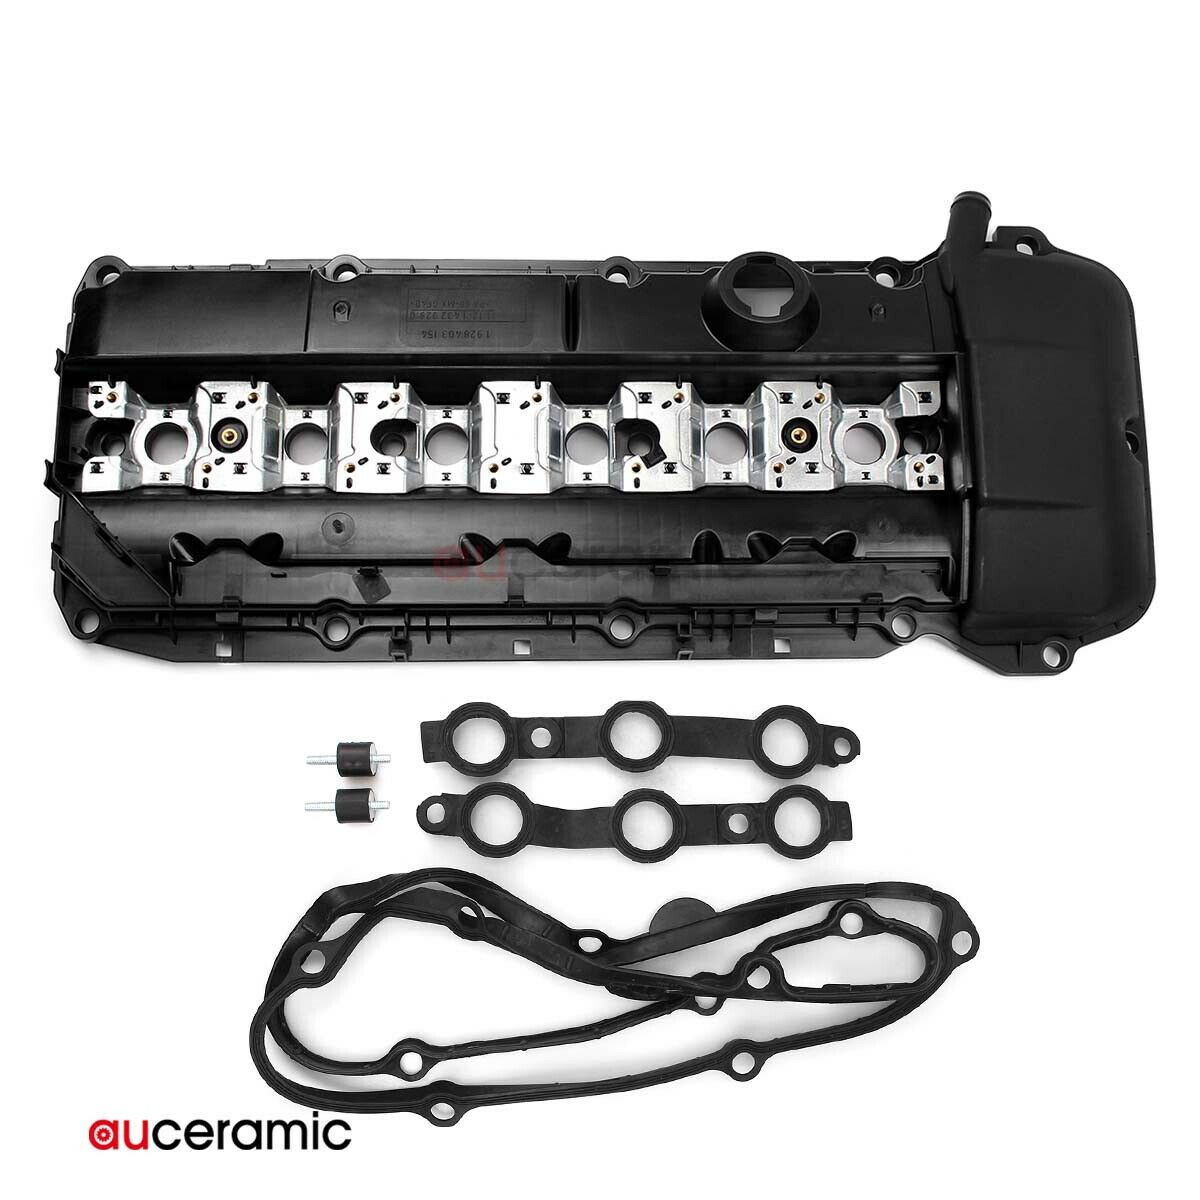 SET of 6 Engine Valve Cover Nuts Fits BMW X3,X5,Z4,325//330Ci,525//530i